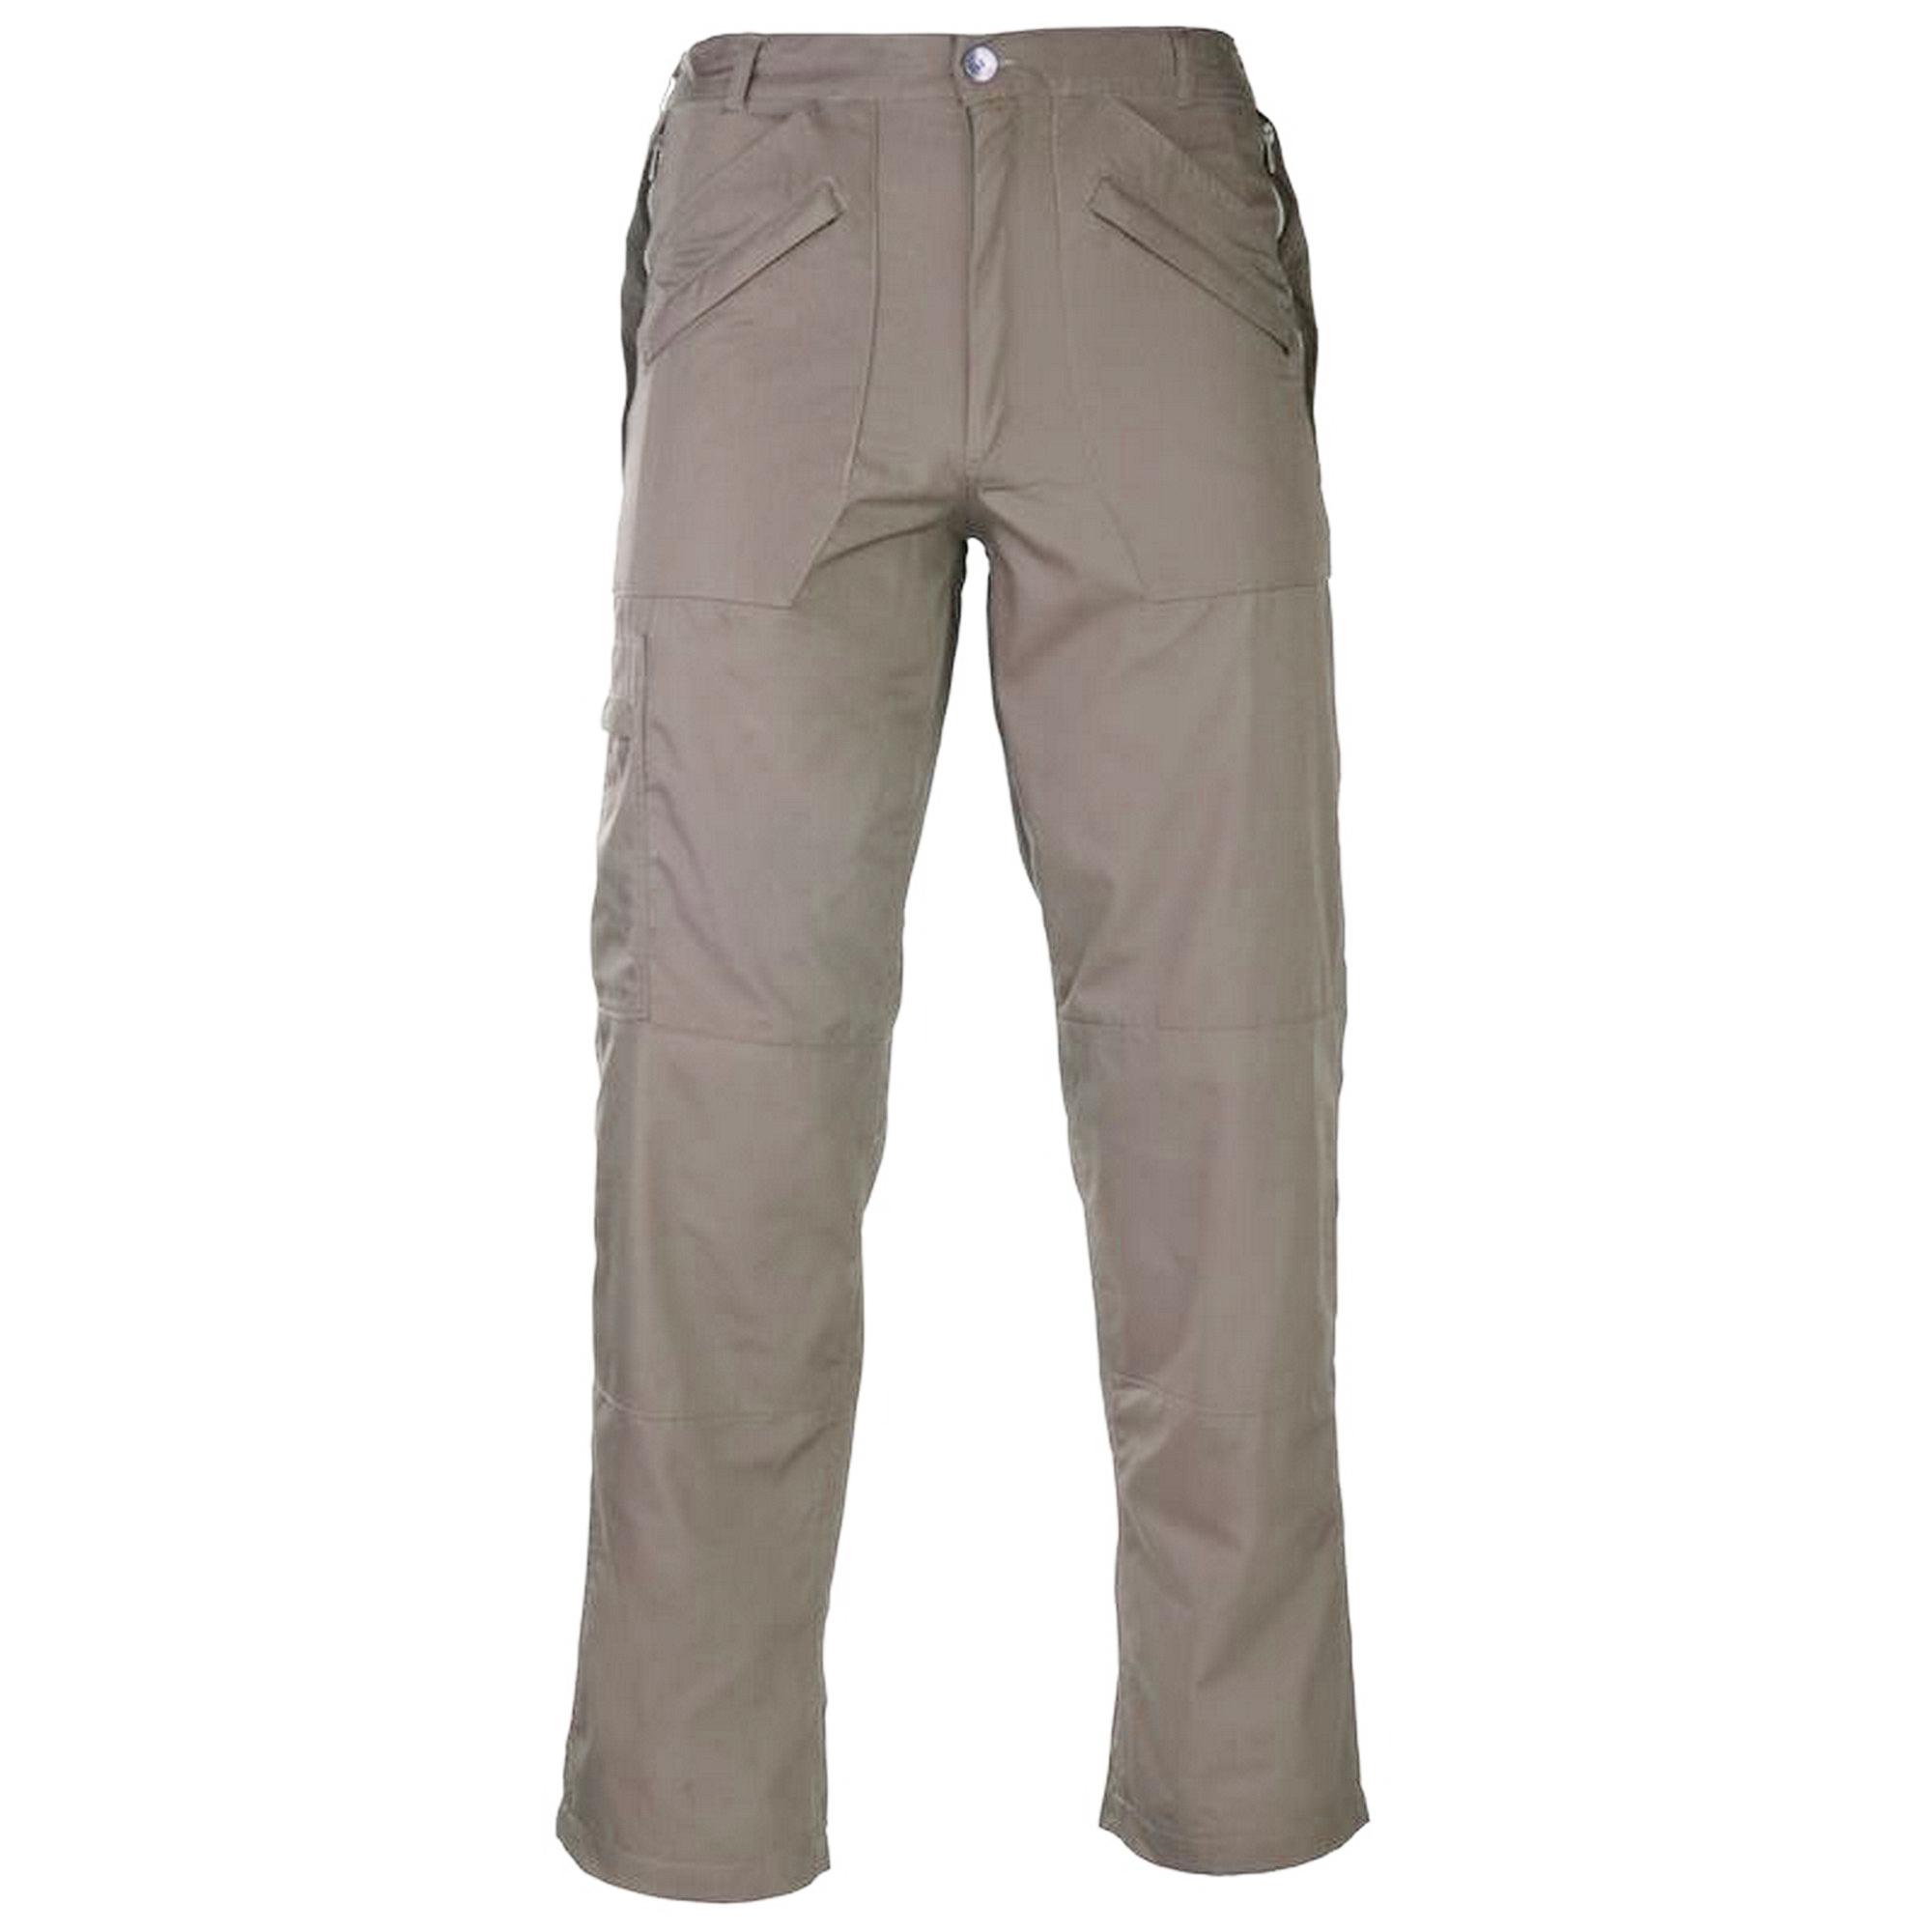 Regatta-Mens-Action-II-Water-Repellent-Work-Trousers